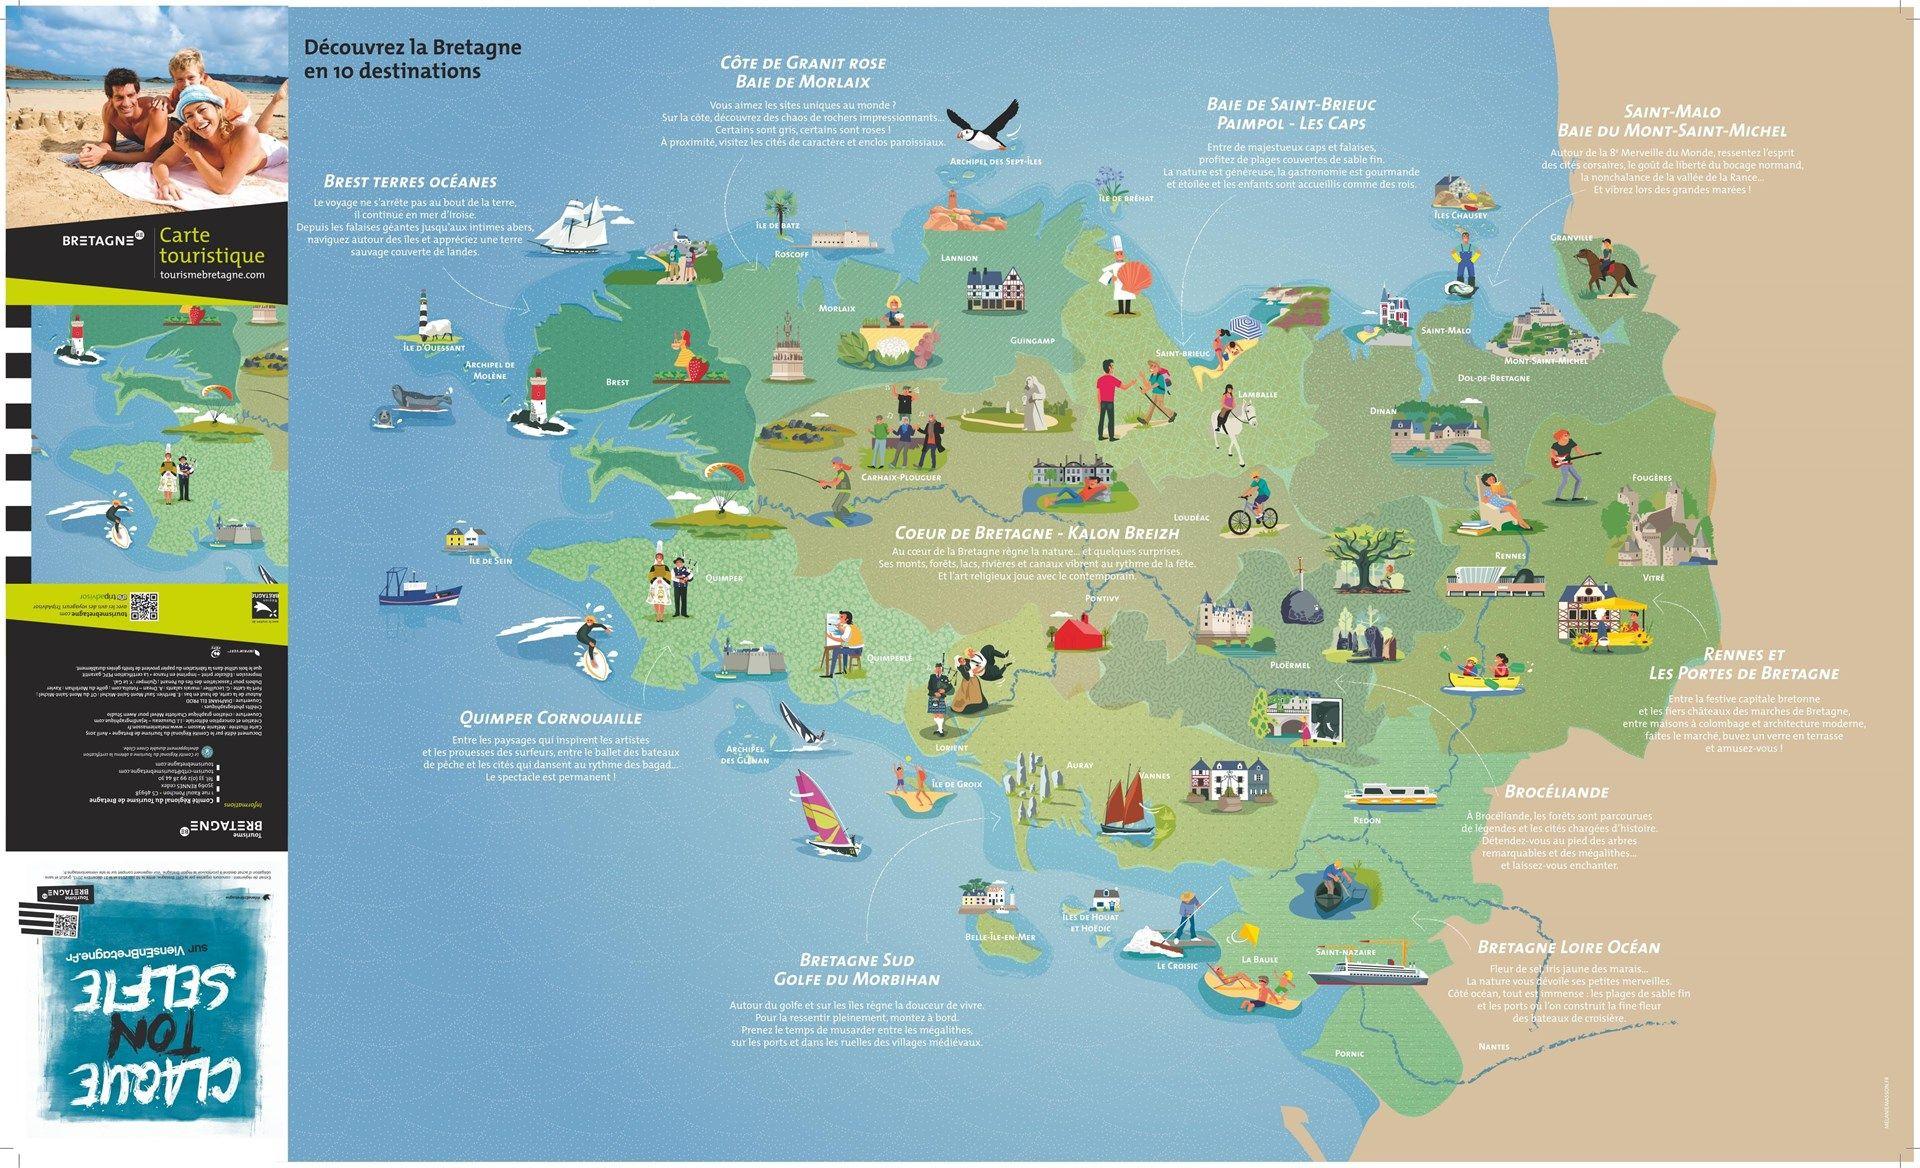 Bretagne #Bretagne avec Le Bon Coin Buffet Ile De France